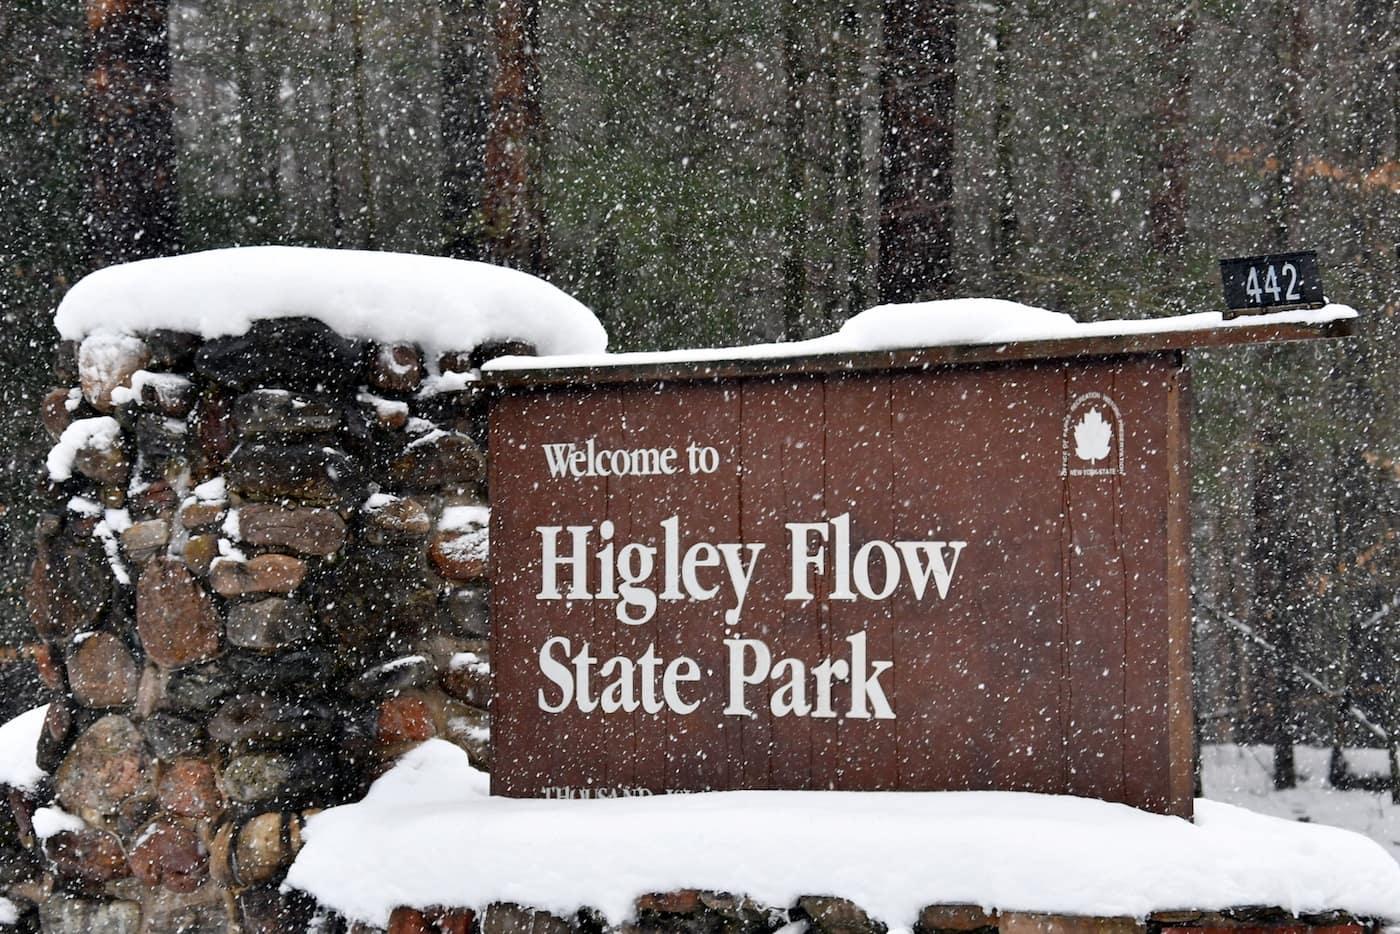 colton-winterfest-2020-higley-flow-state-park1